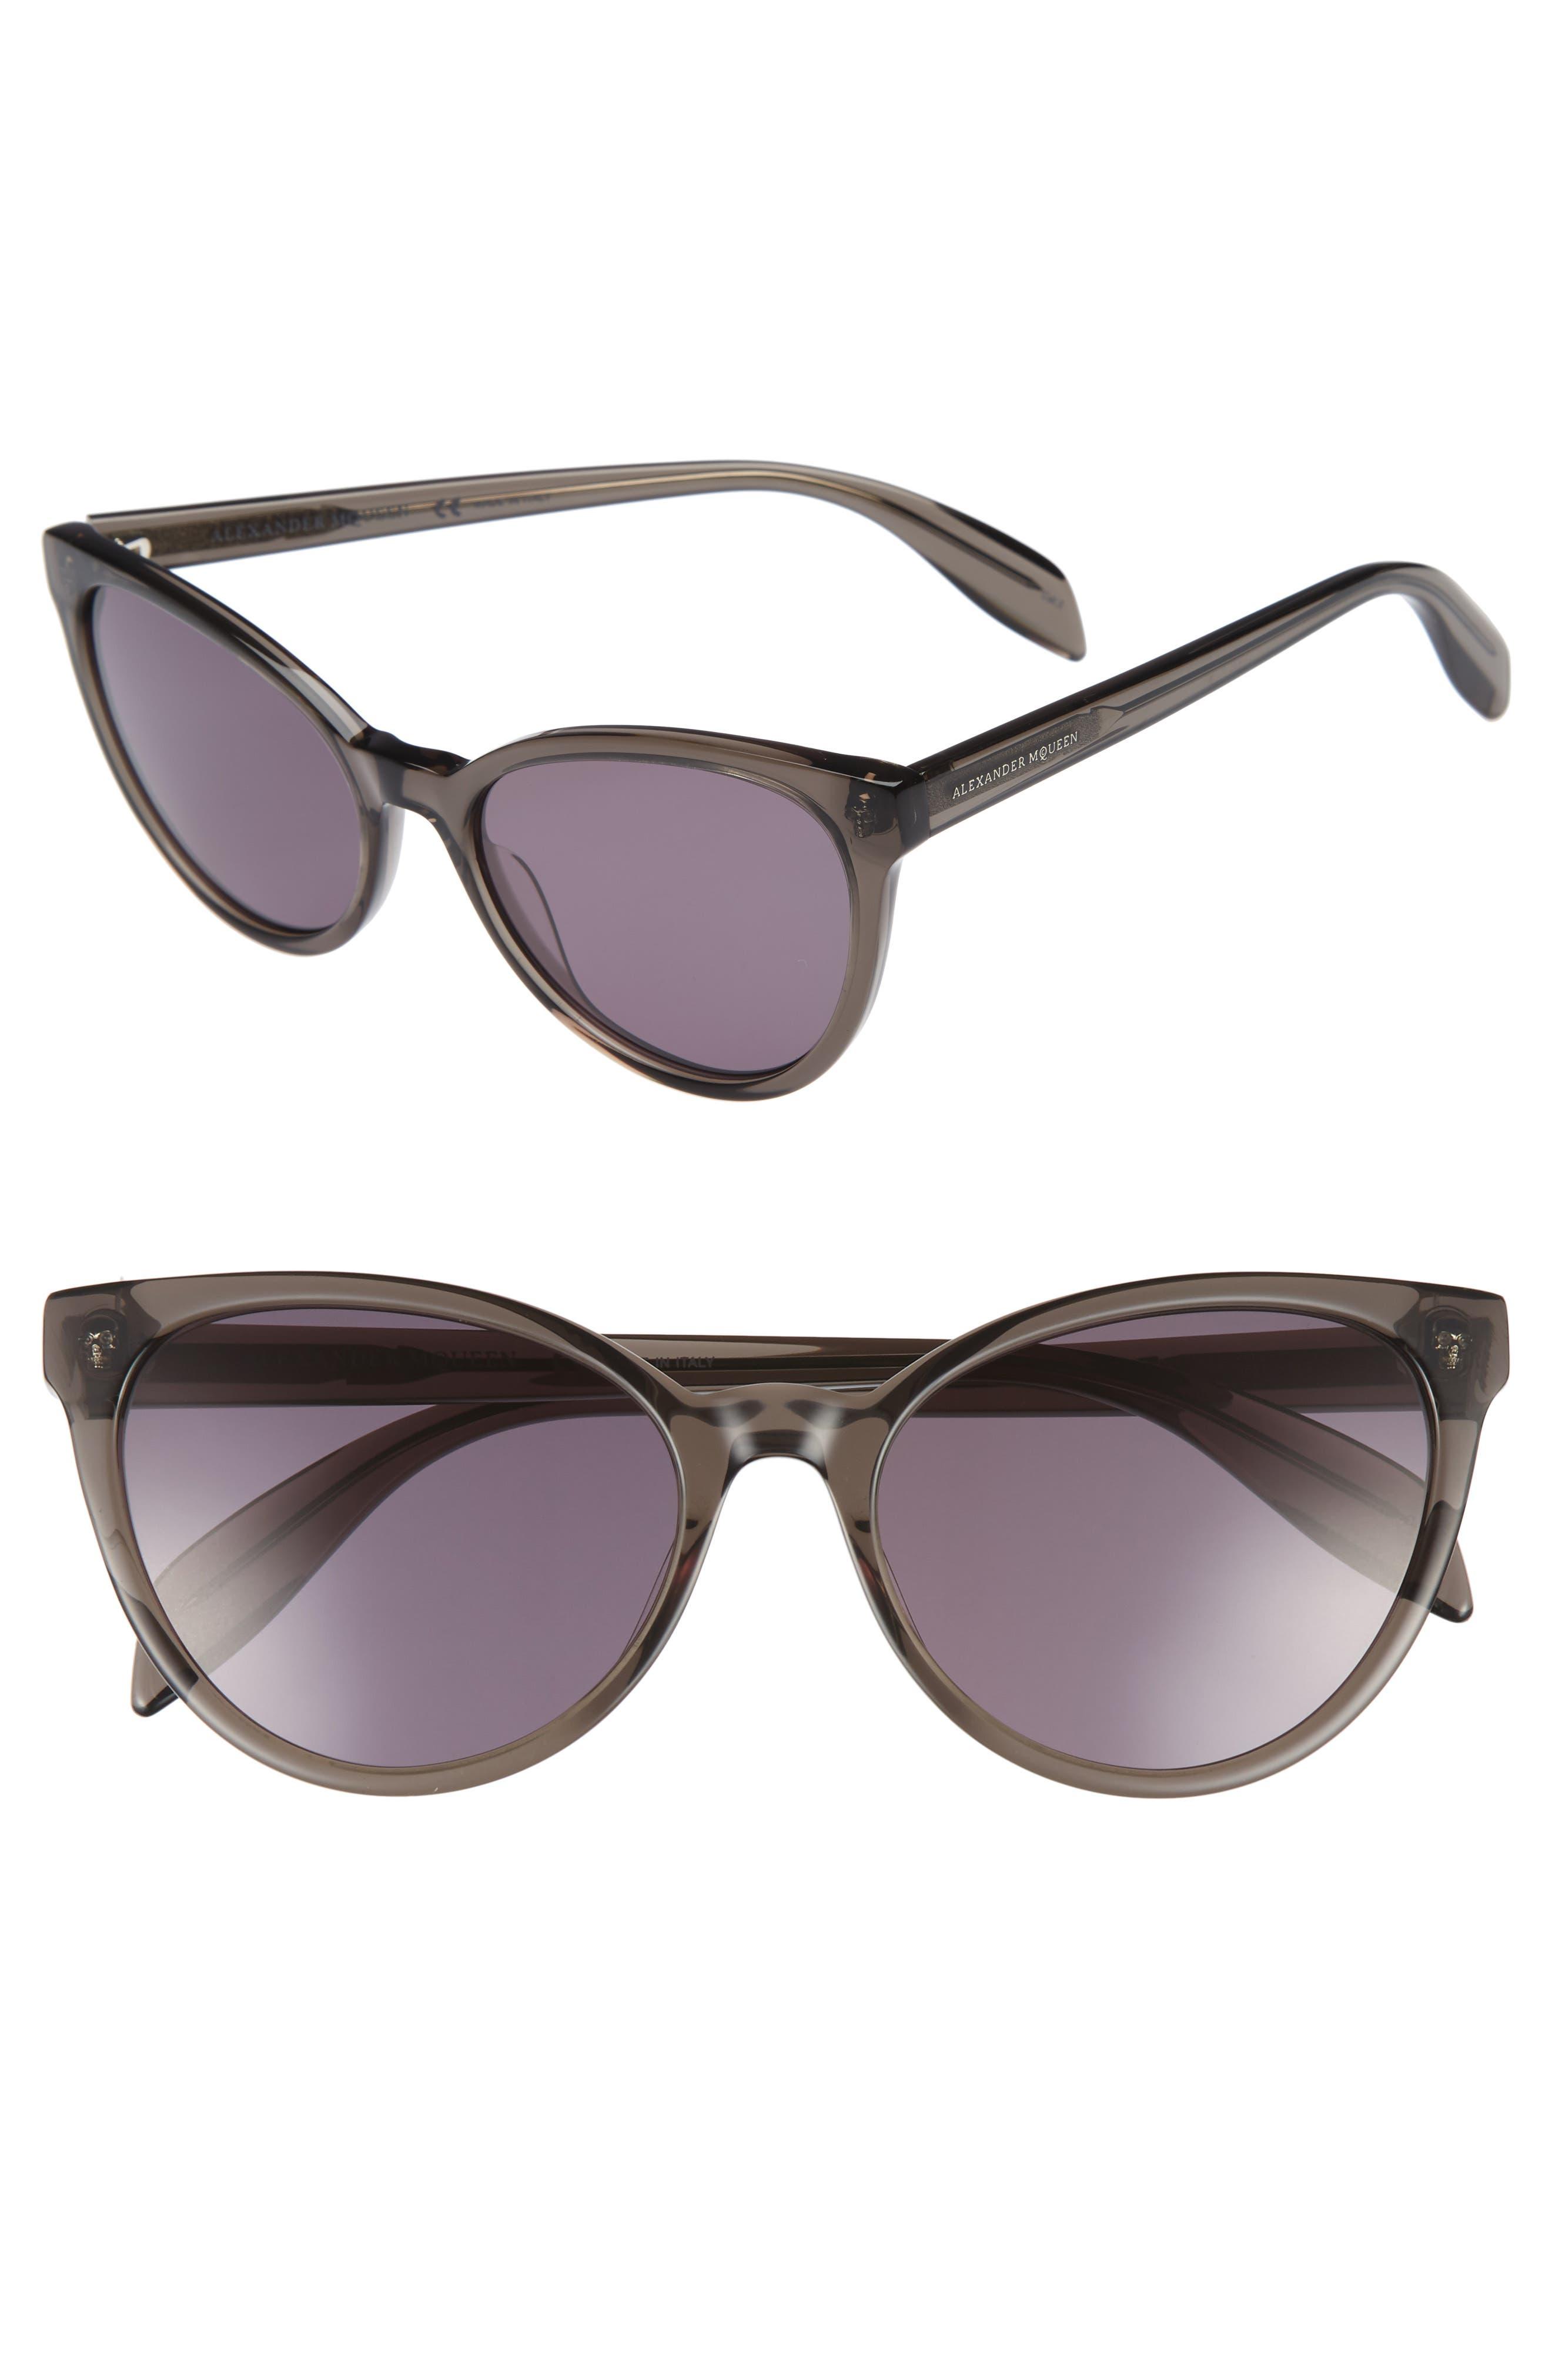 55mm Cat Eye Sunglasses,                             Main thumbnail 1, color,                             020